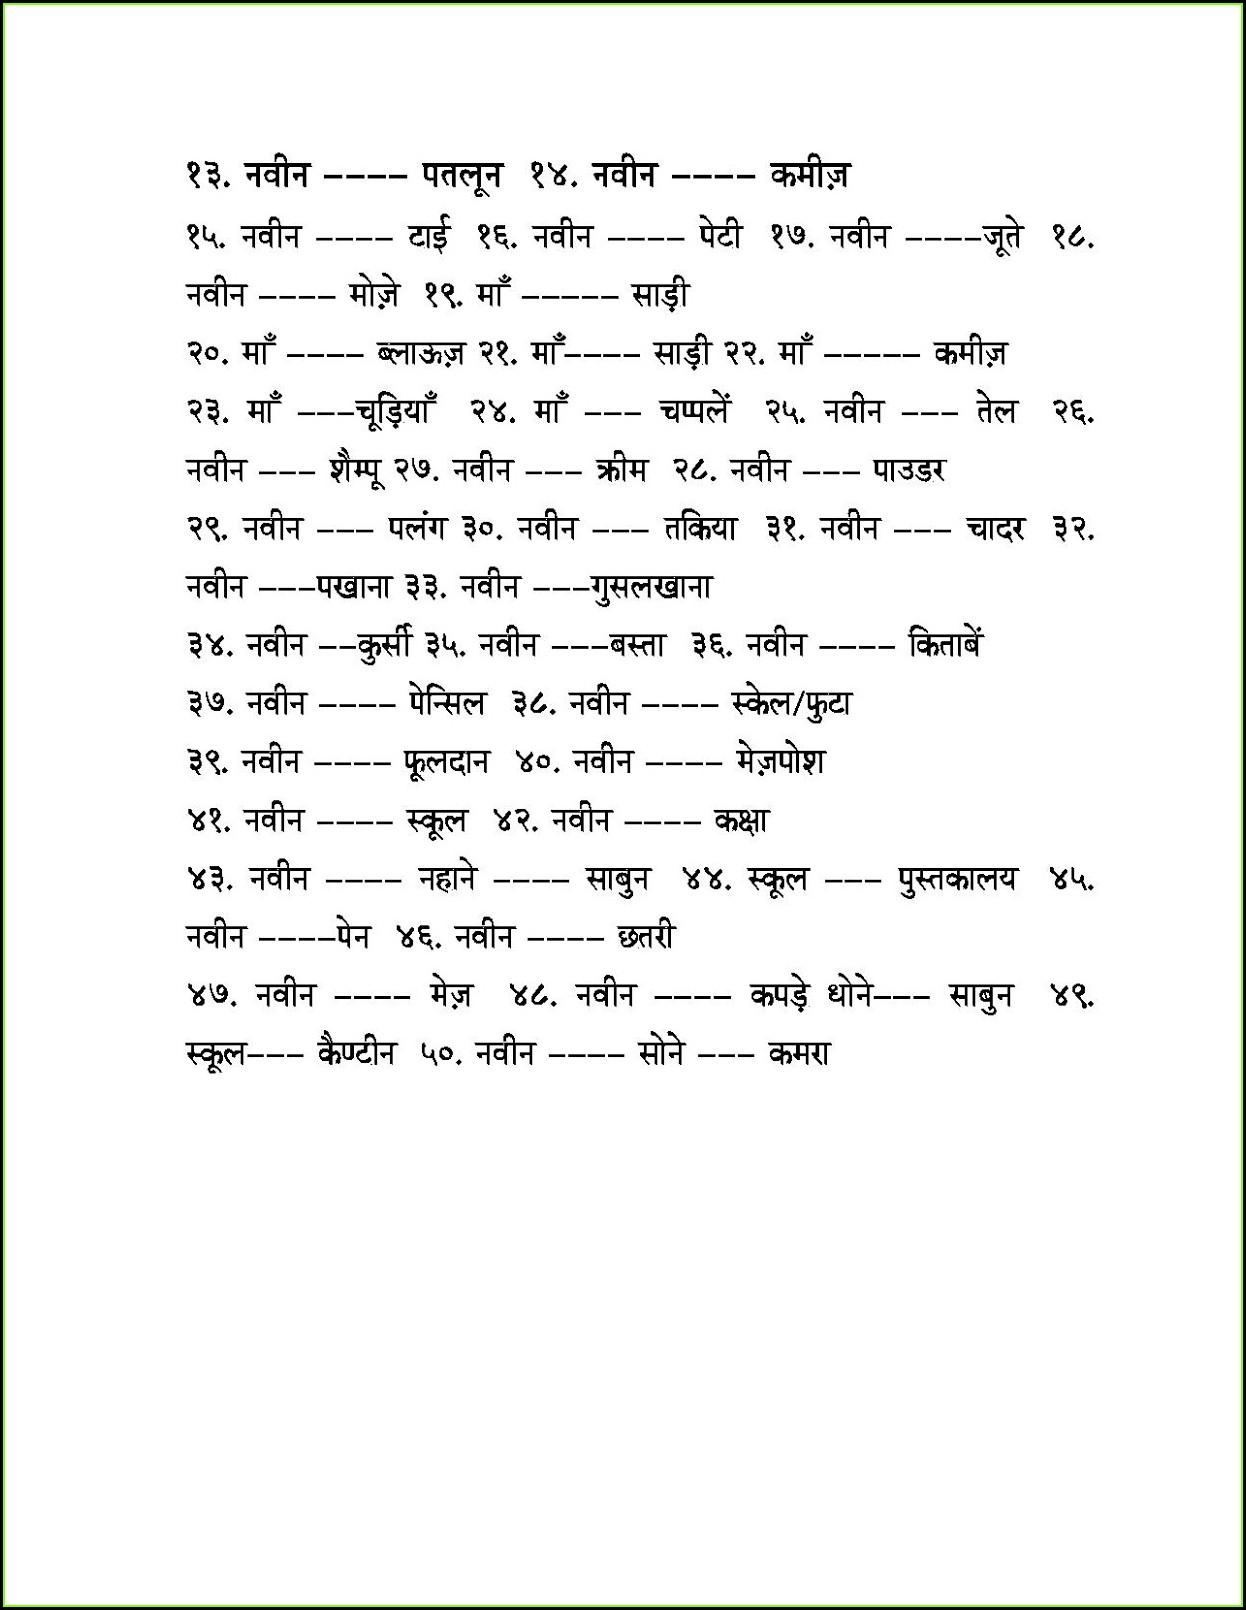 Grade 5 Hindi Worksheet For Class 5